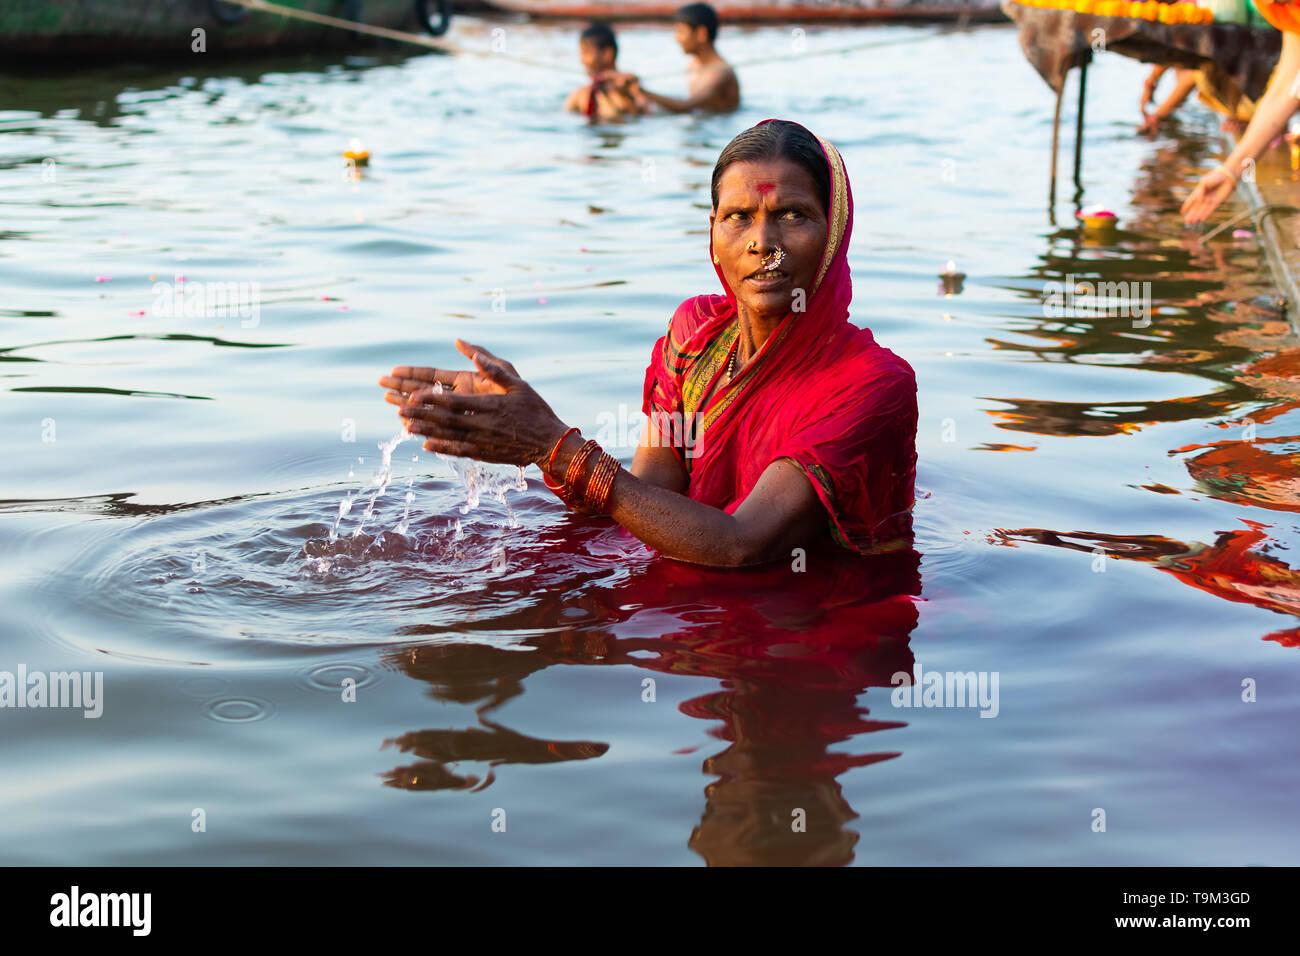 Varanasi, India, 27 Mar 2019 - Hindu woman in sari making offering to the gods in Ganga river at Varanasi, India - Stock Image